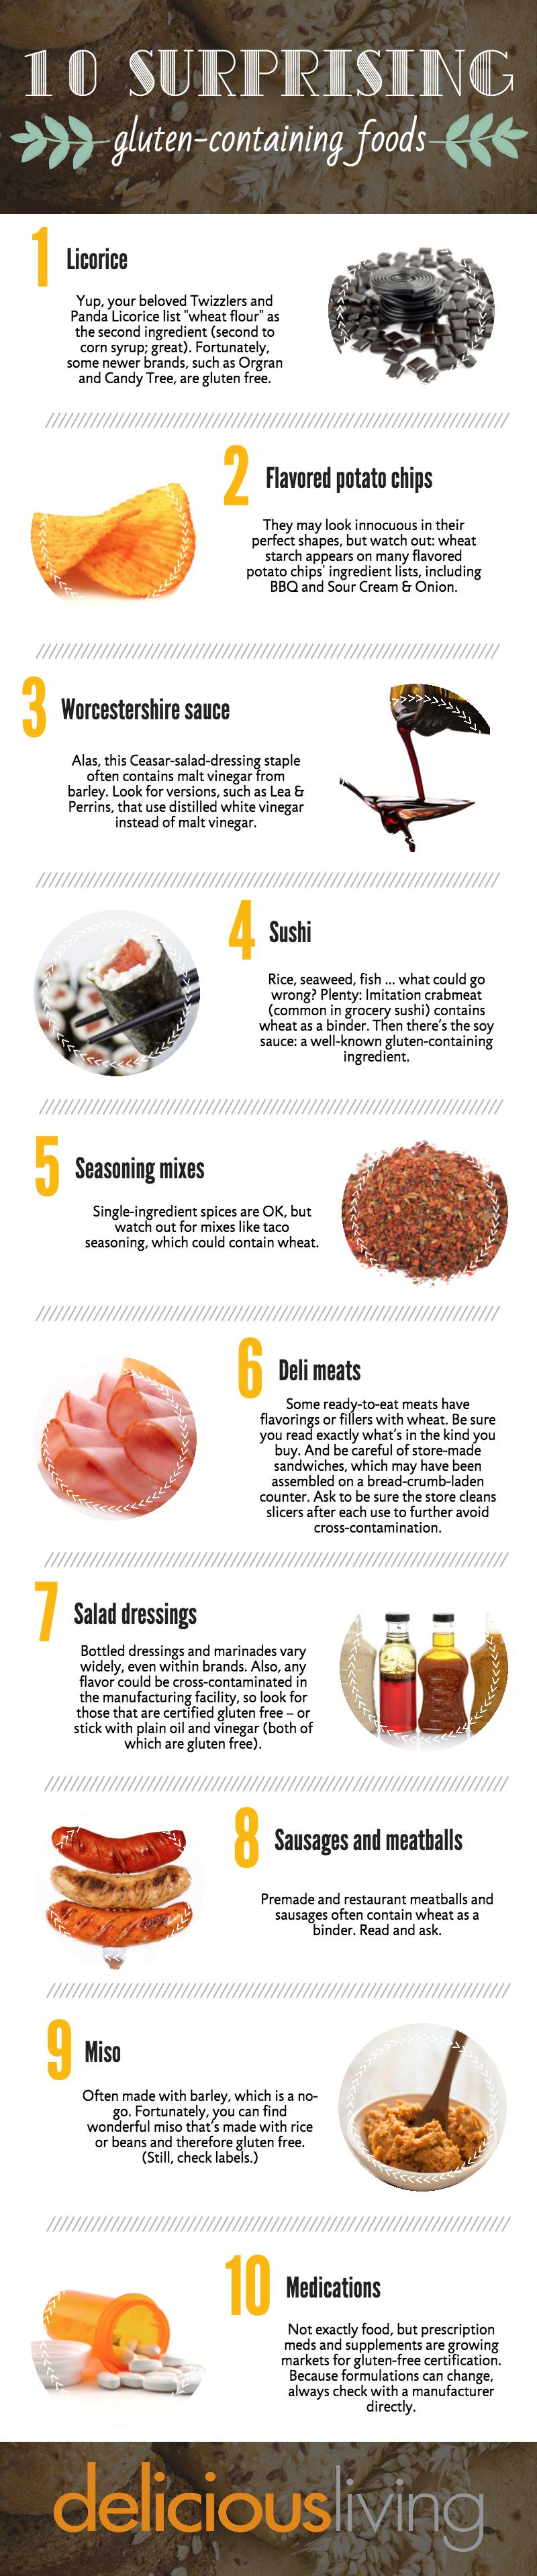 Infographic 10 Surprising Gluten Containing Foods Gluten Free Info Gluten Free Health Foods With Gluten